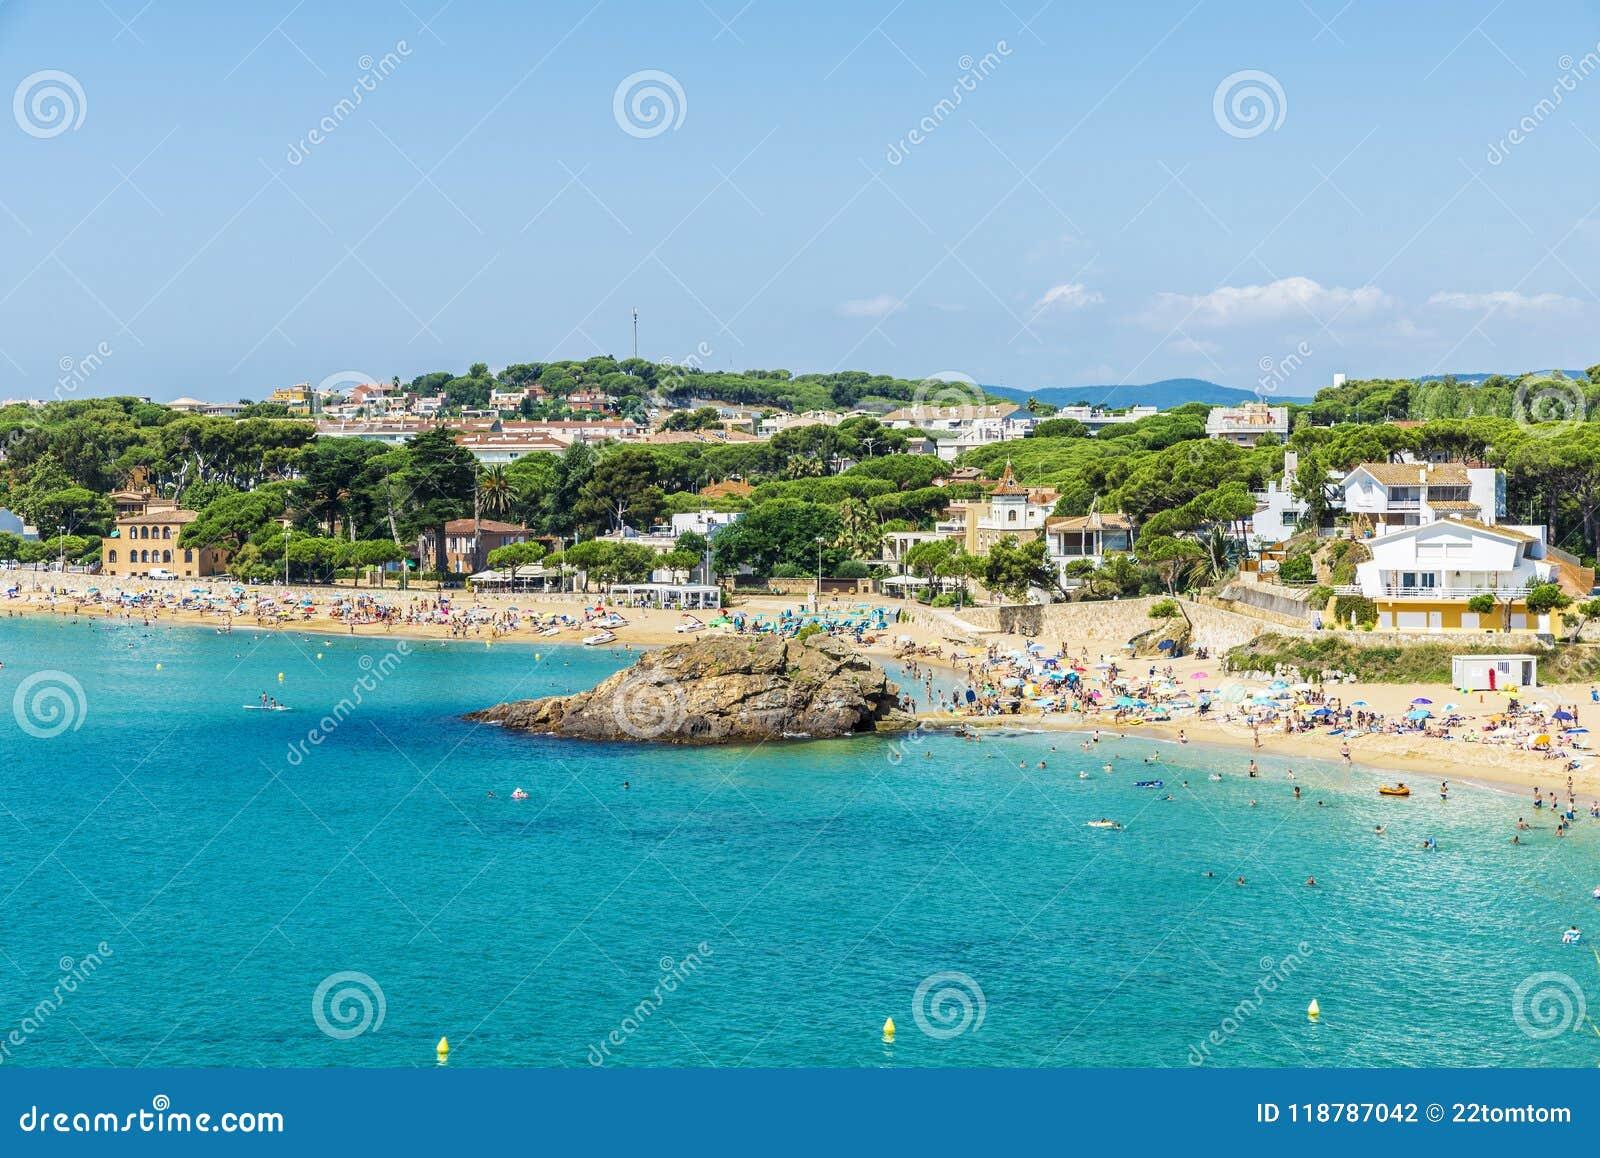 La Fosca Beach Costa Brava Girona Catalonia Spain Stock Photo